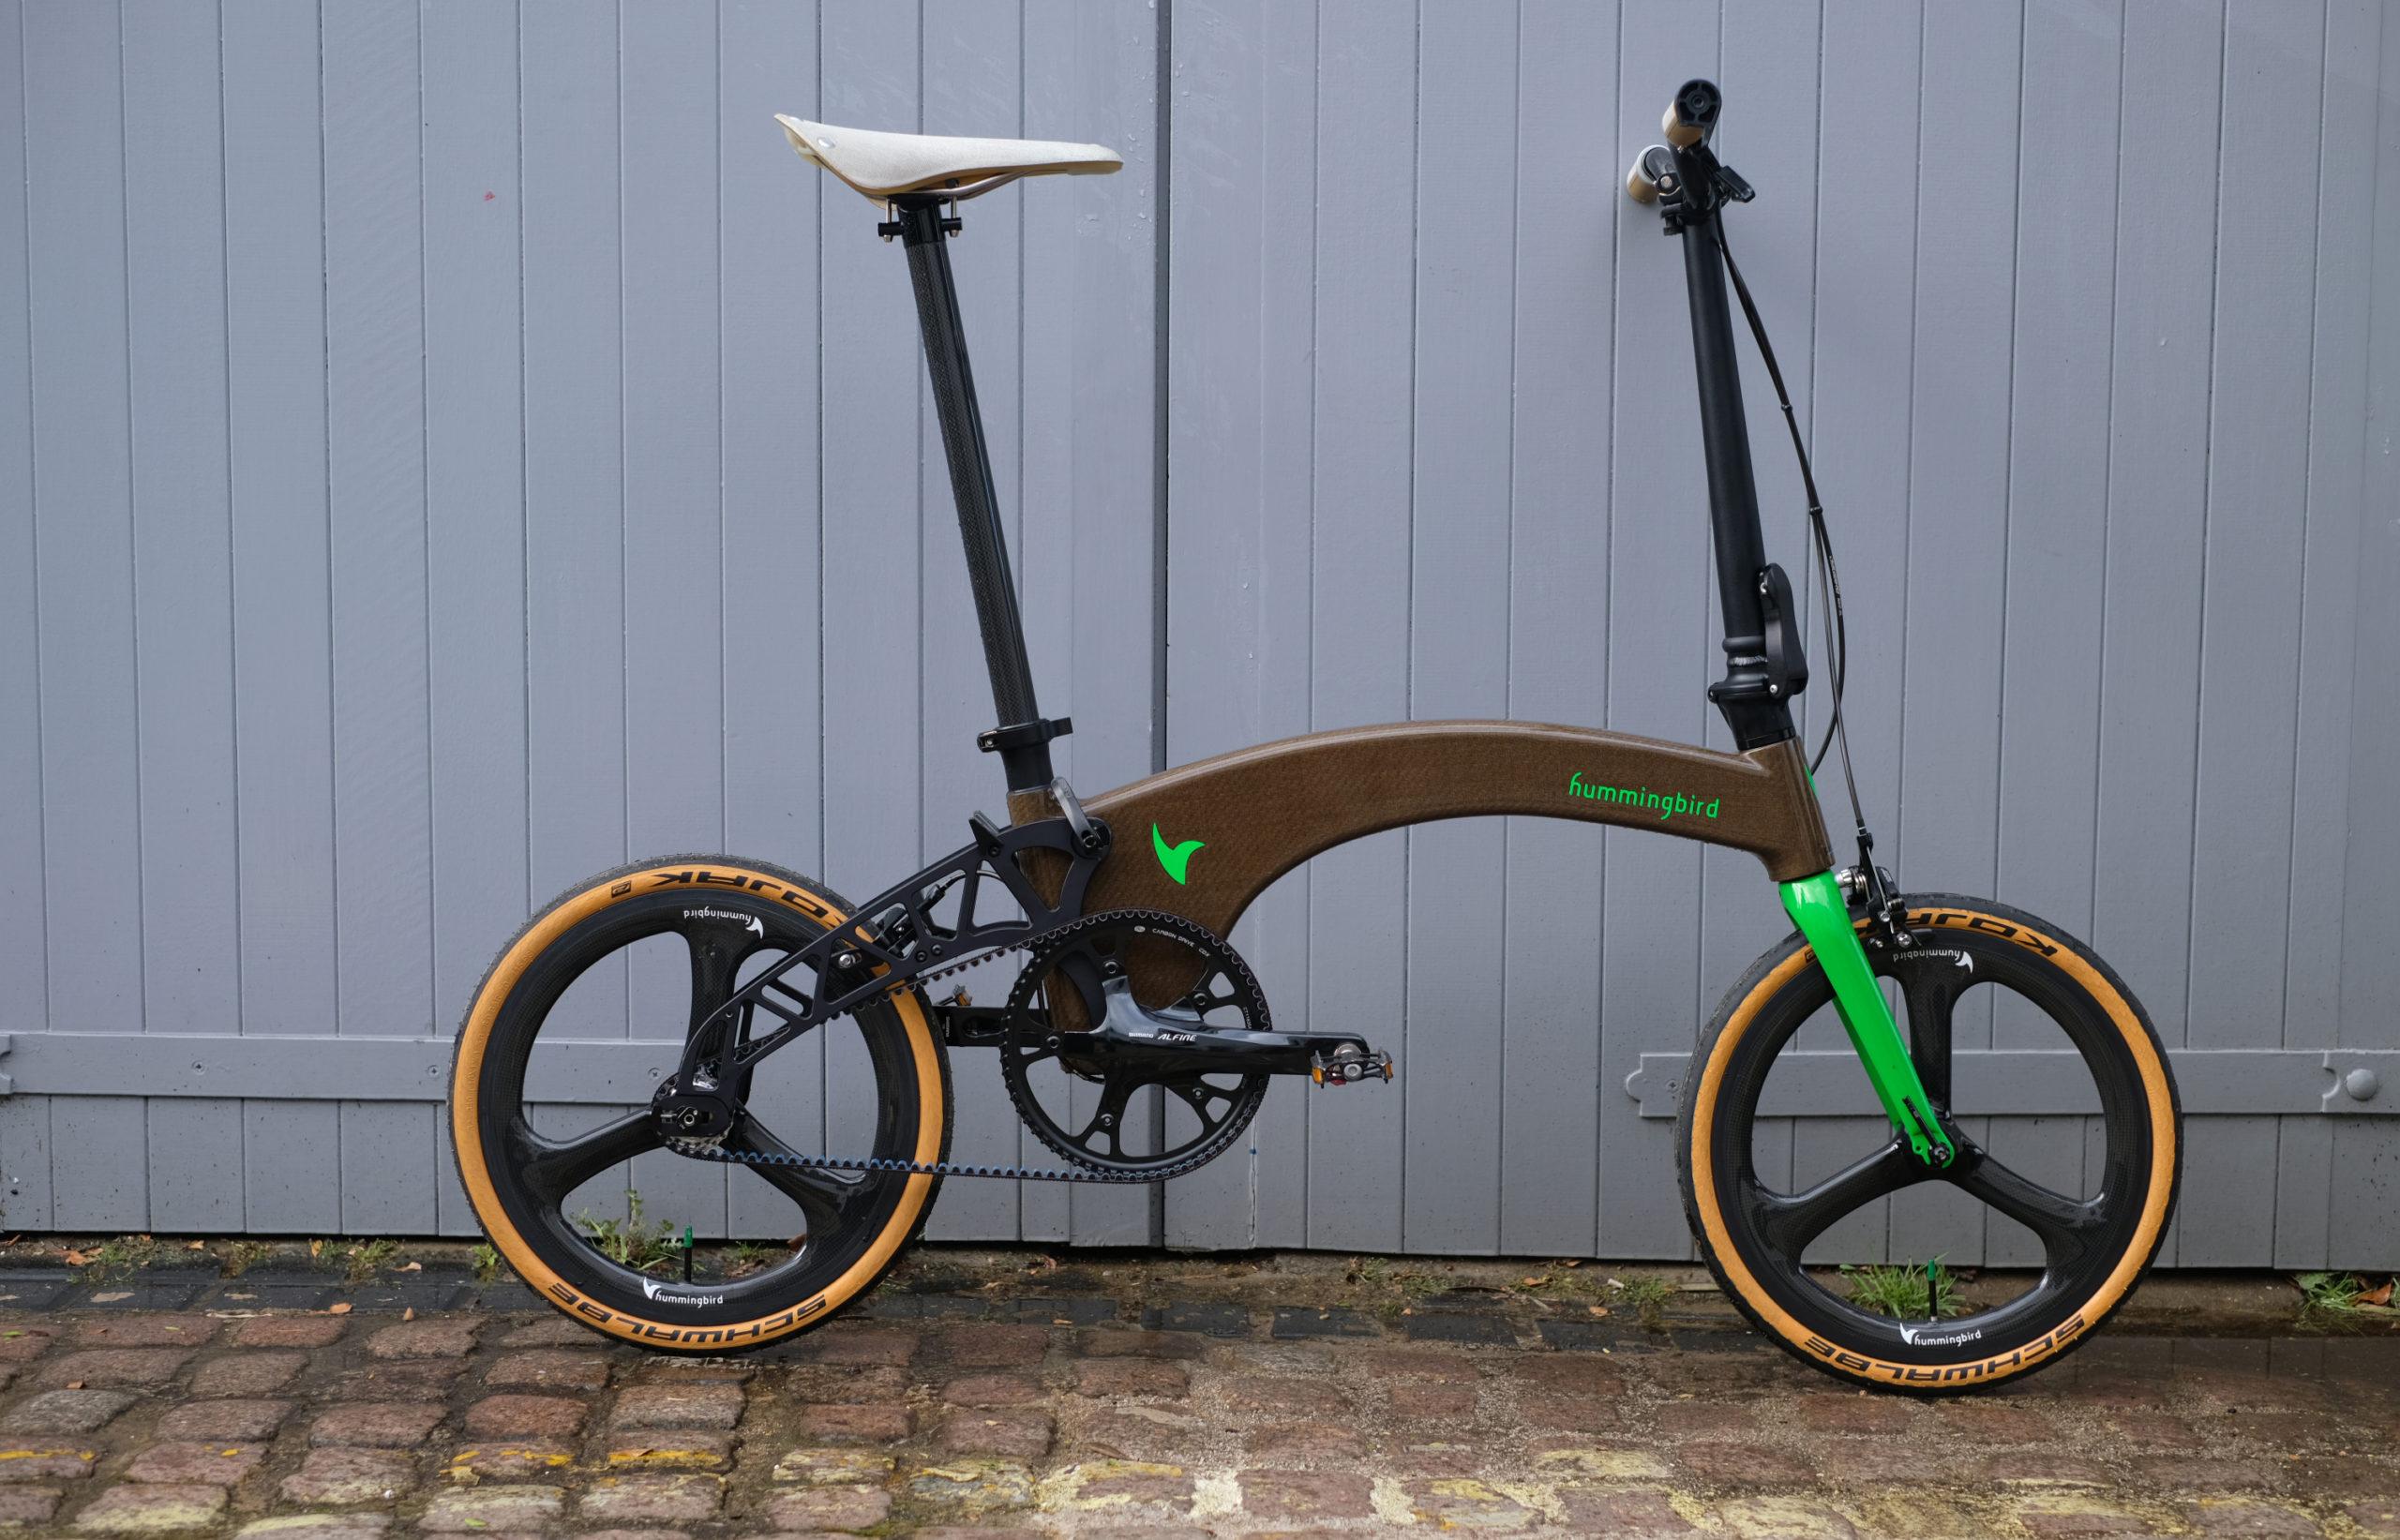 Hummingbird grows the world's lightest folding bike - Cyclist